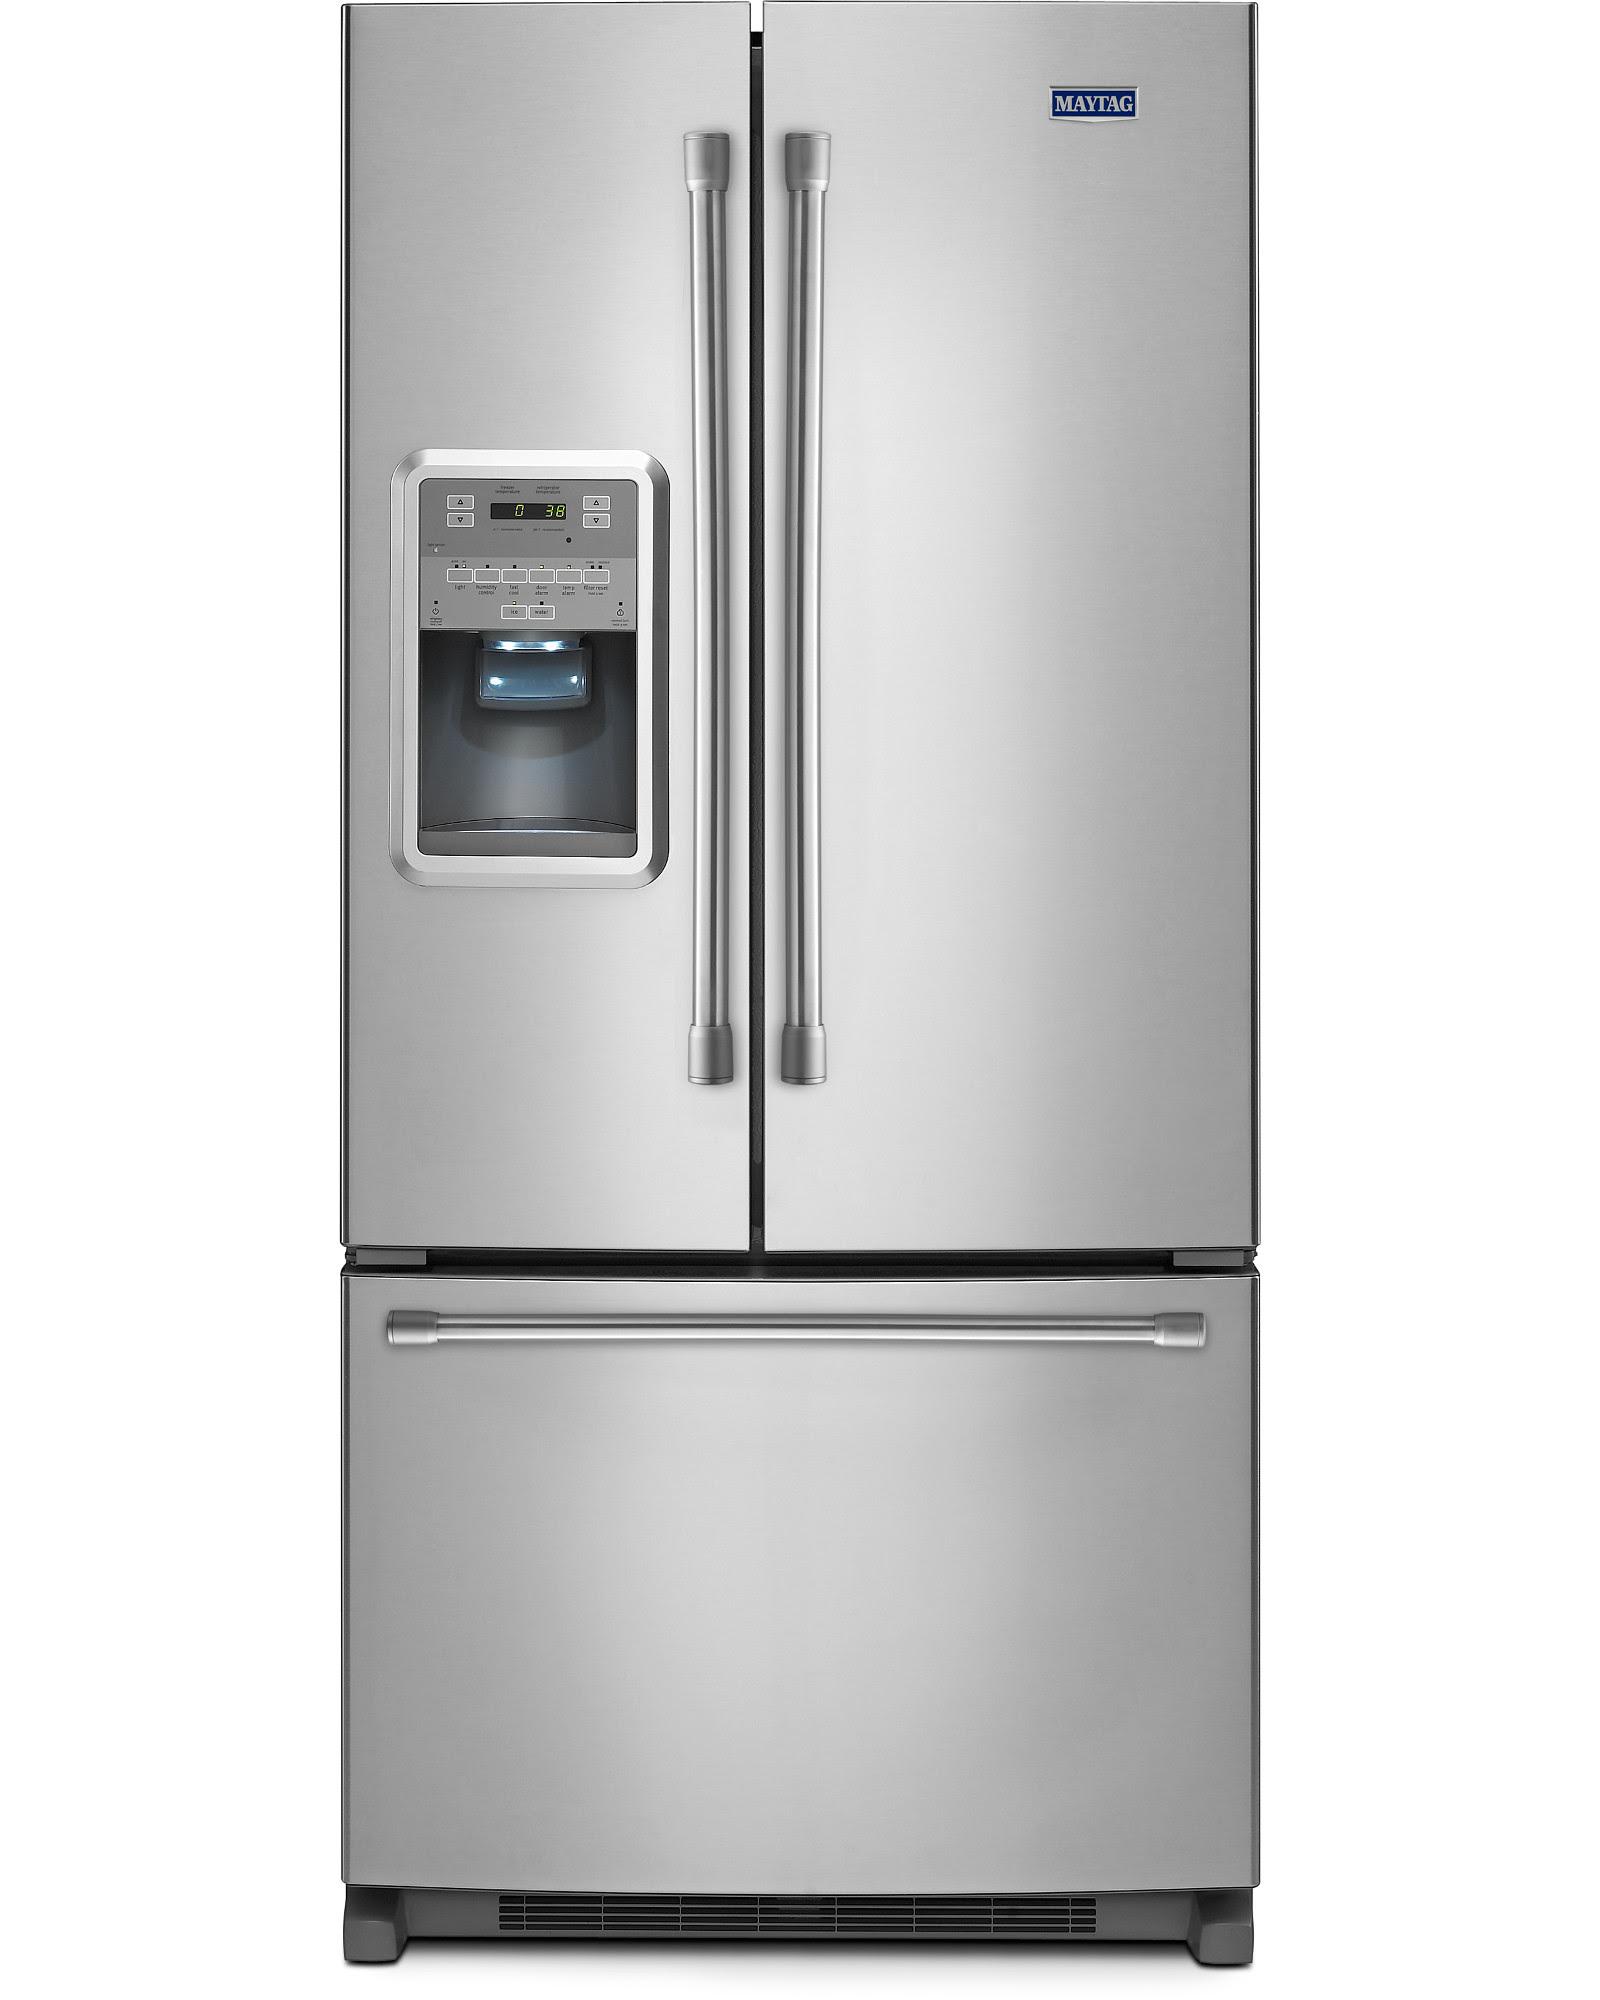 UPC Maytag 22 cu ft French Door Refrigerator w